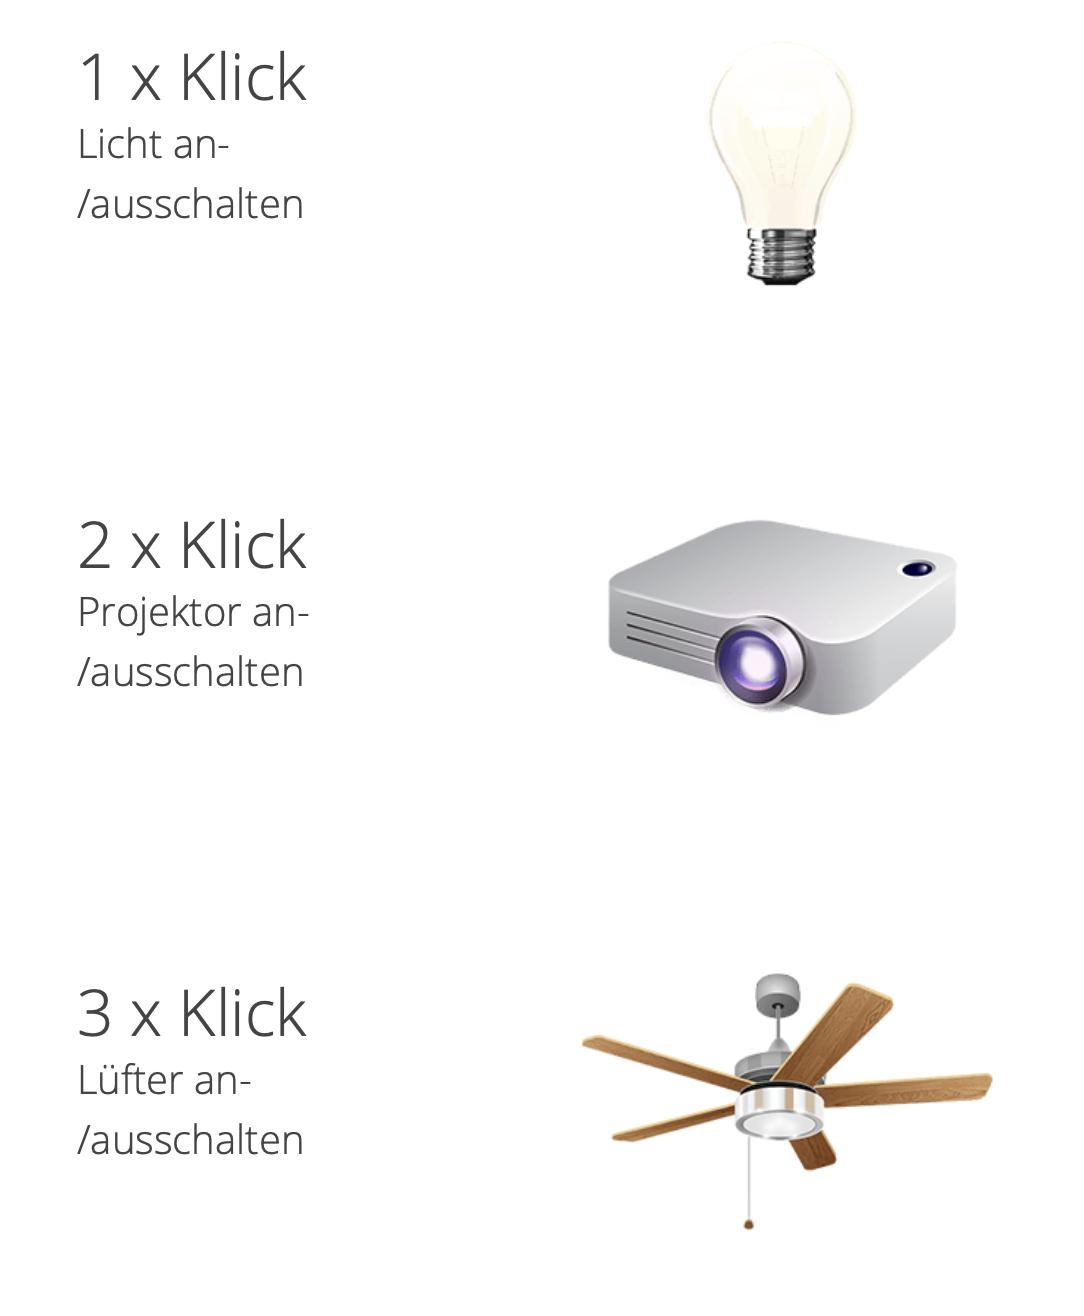 Smart Home München: Klick-Sequenzen Smart home the button